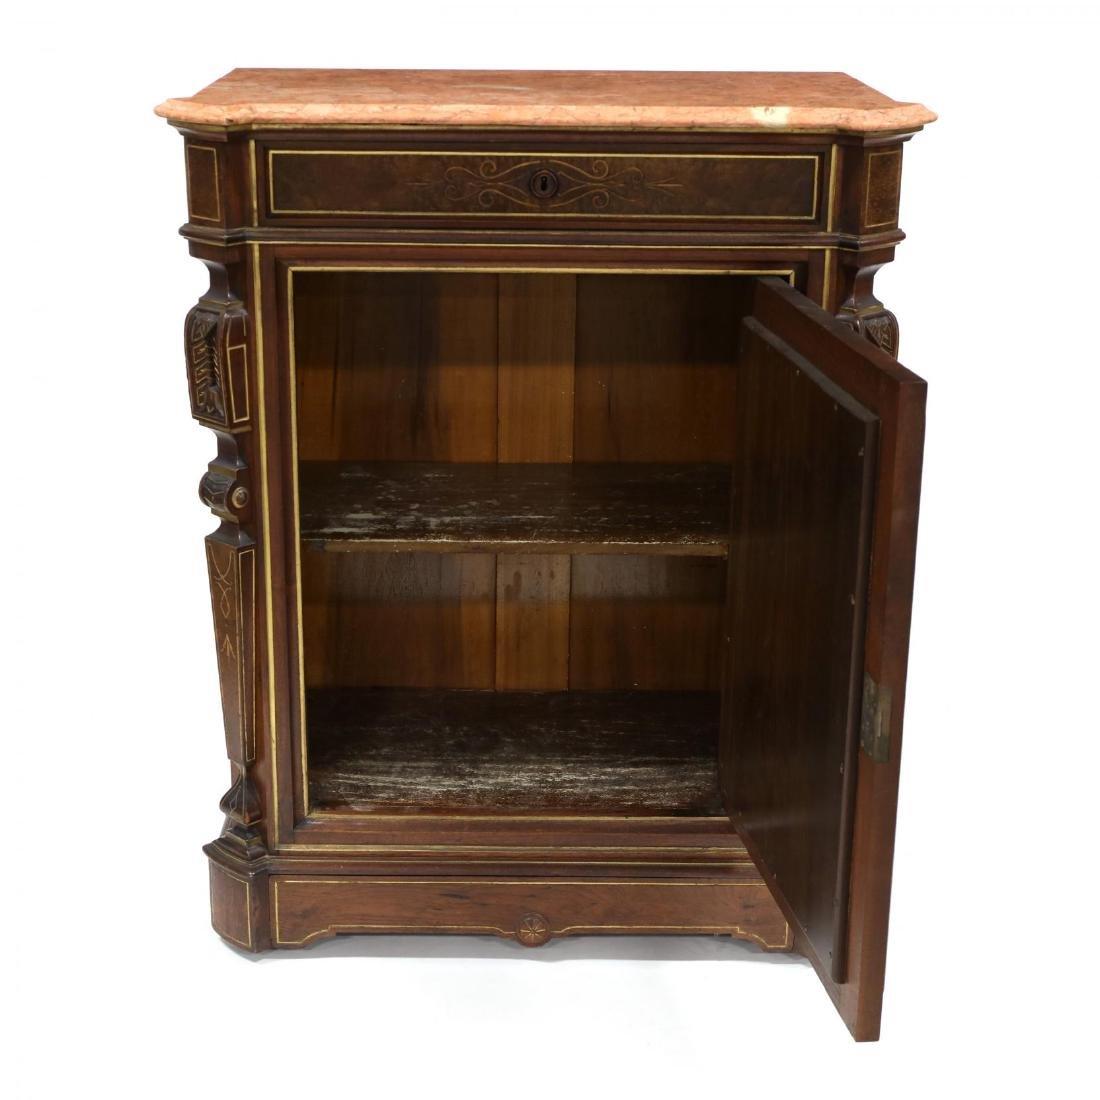 American Renaissance Revival Marble Top Cabinet - 4